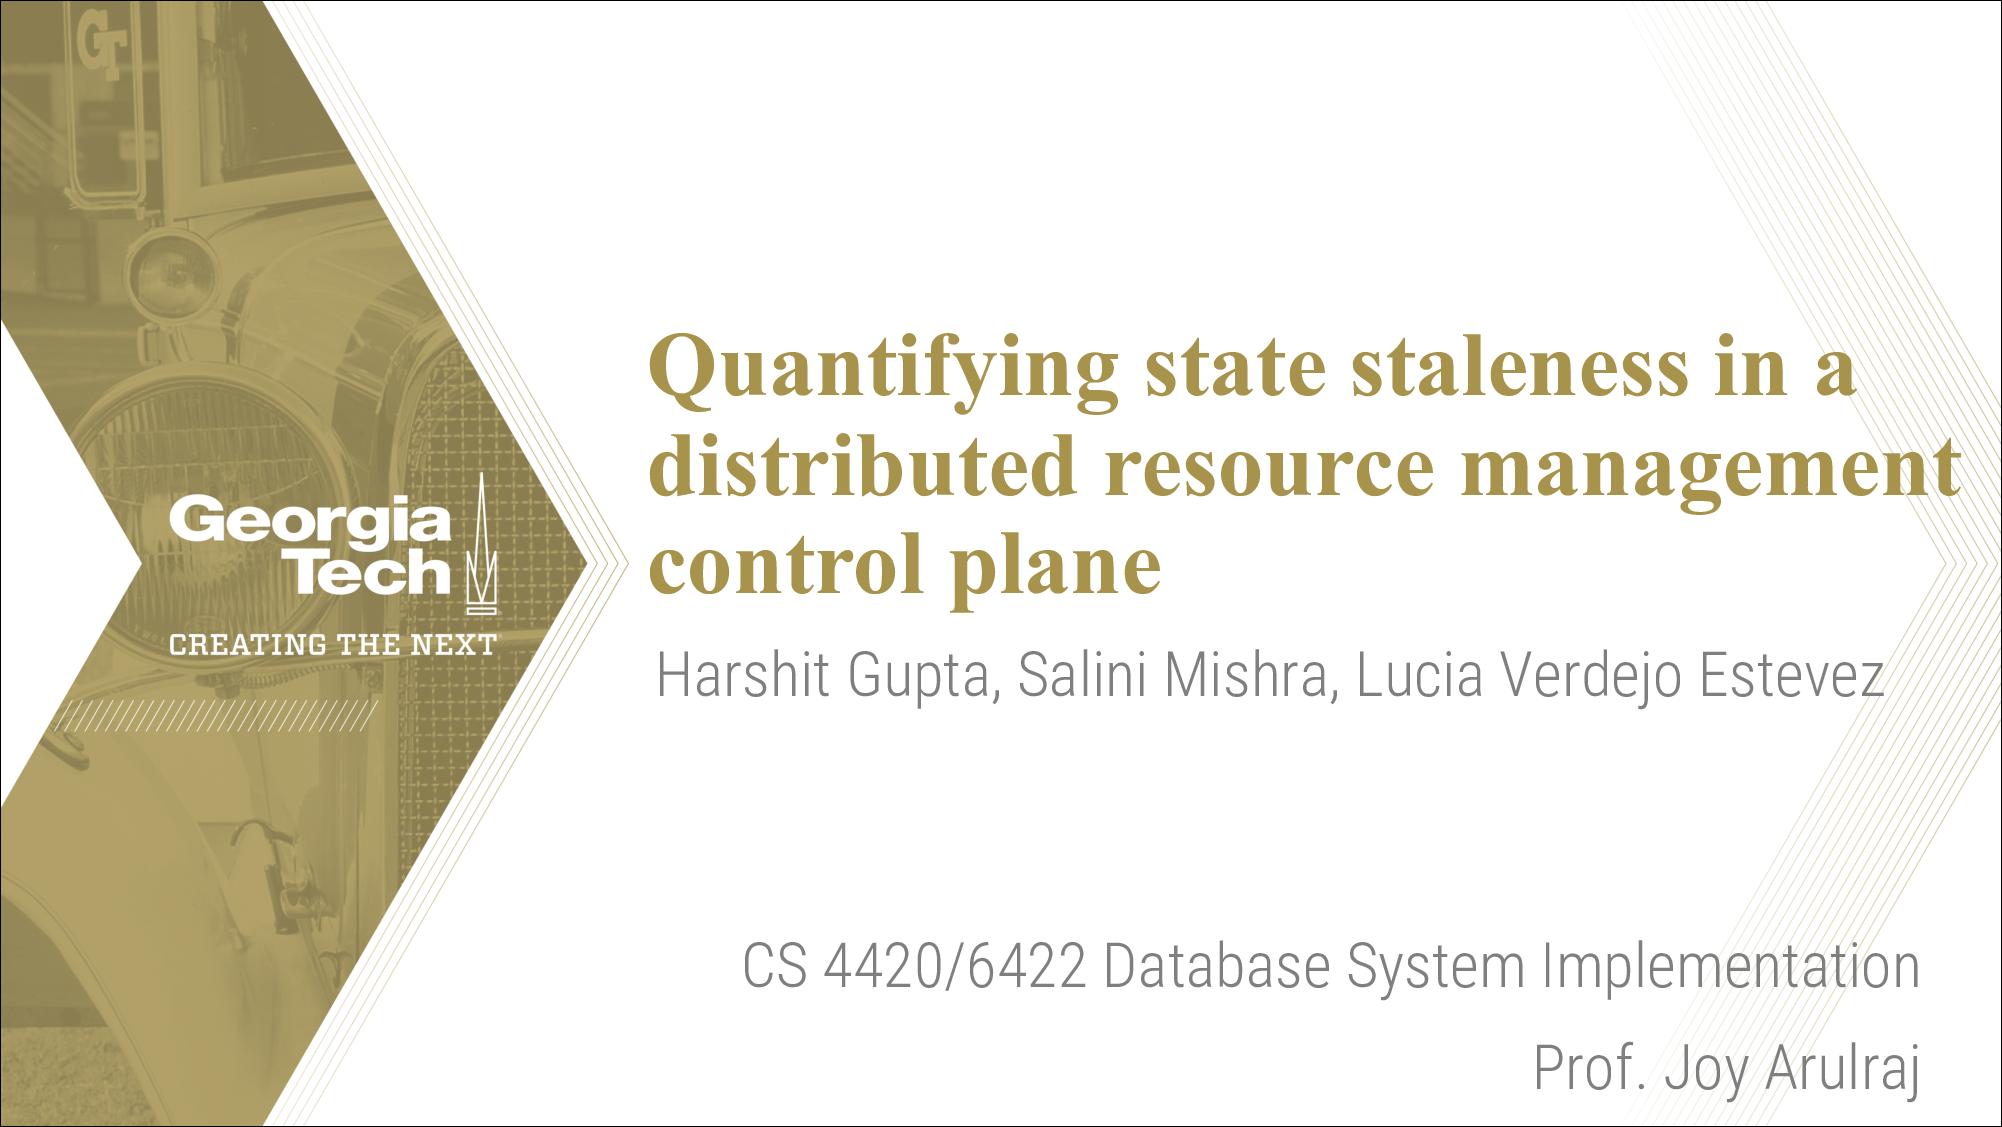 [PRESENTATION] Quantifying State Staleness